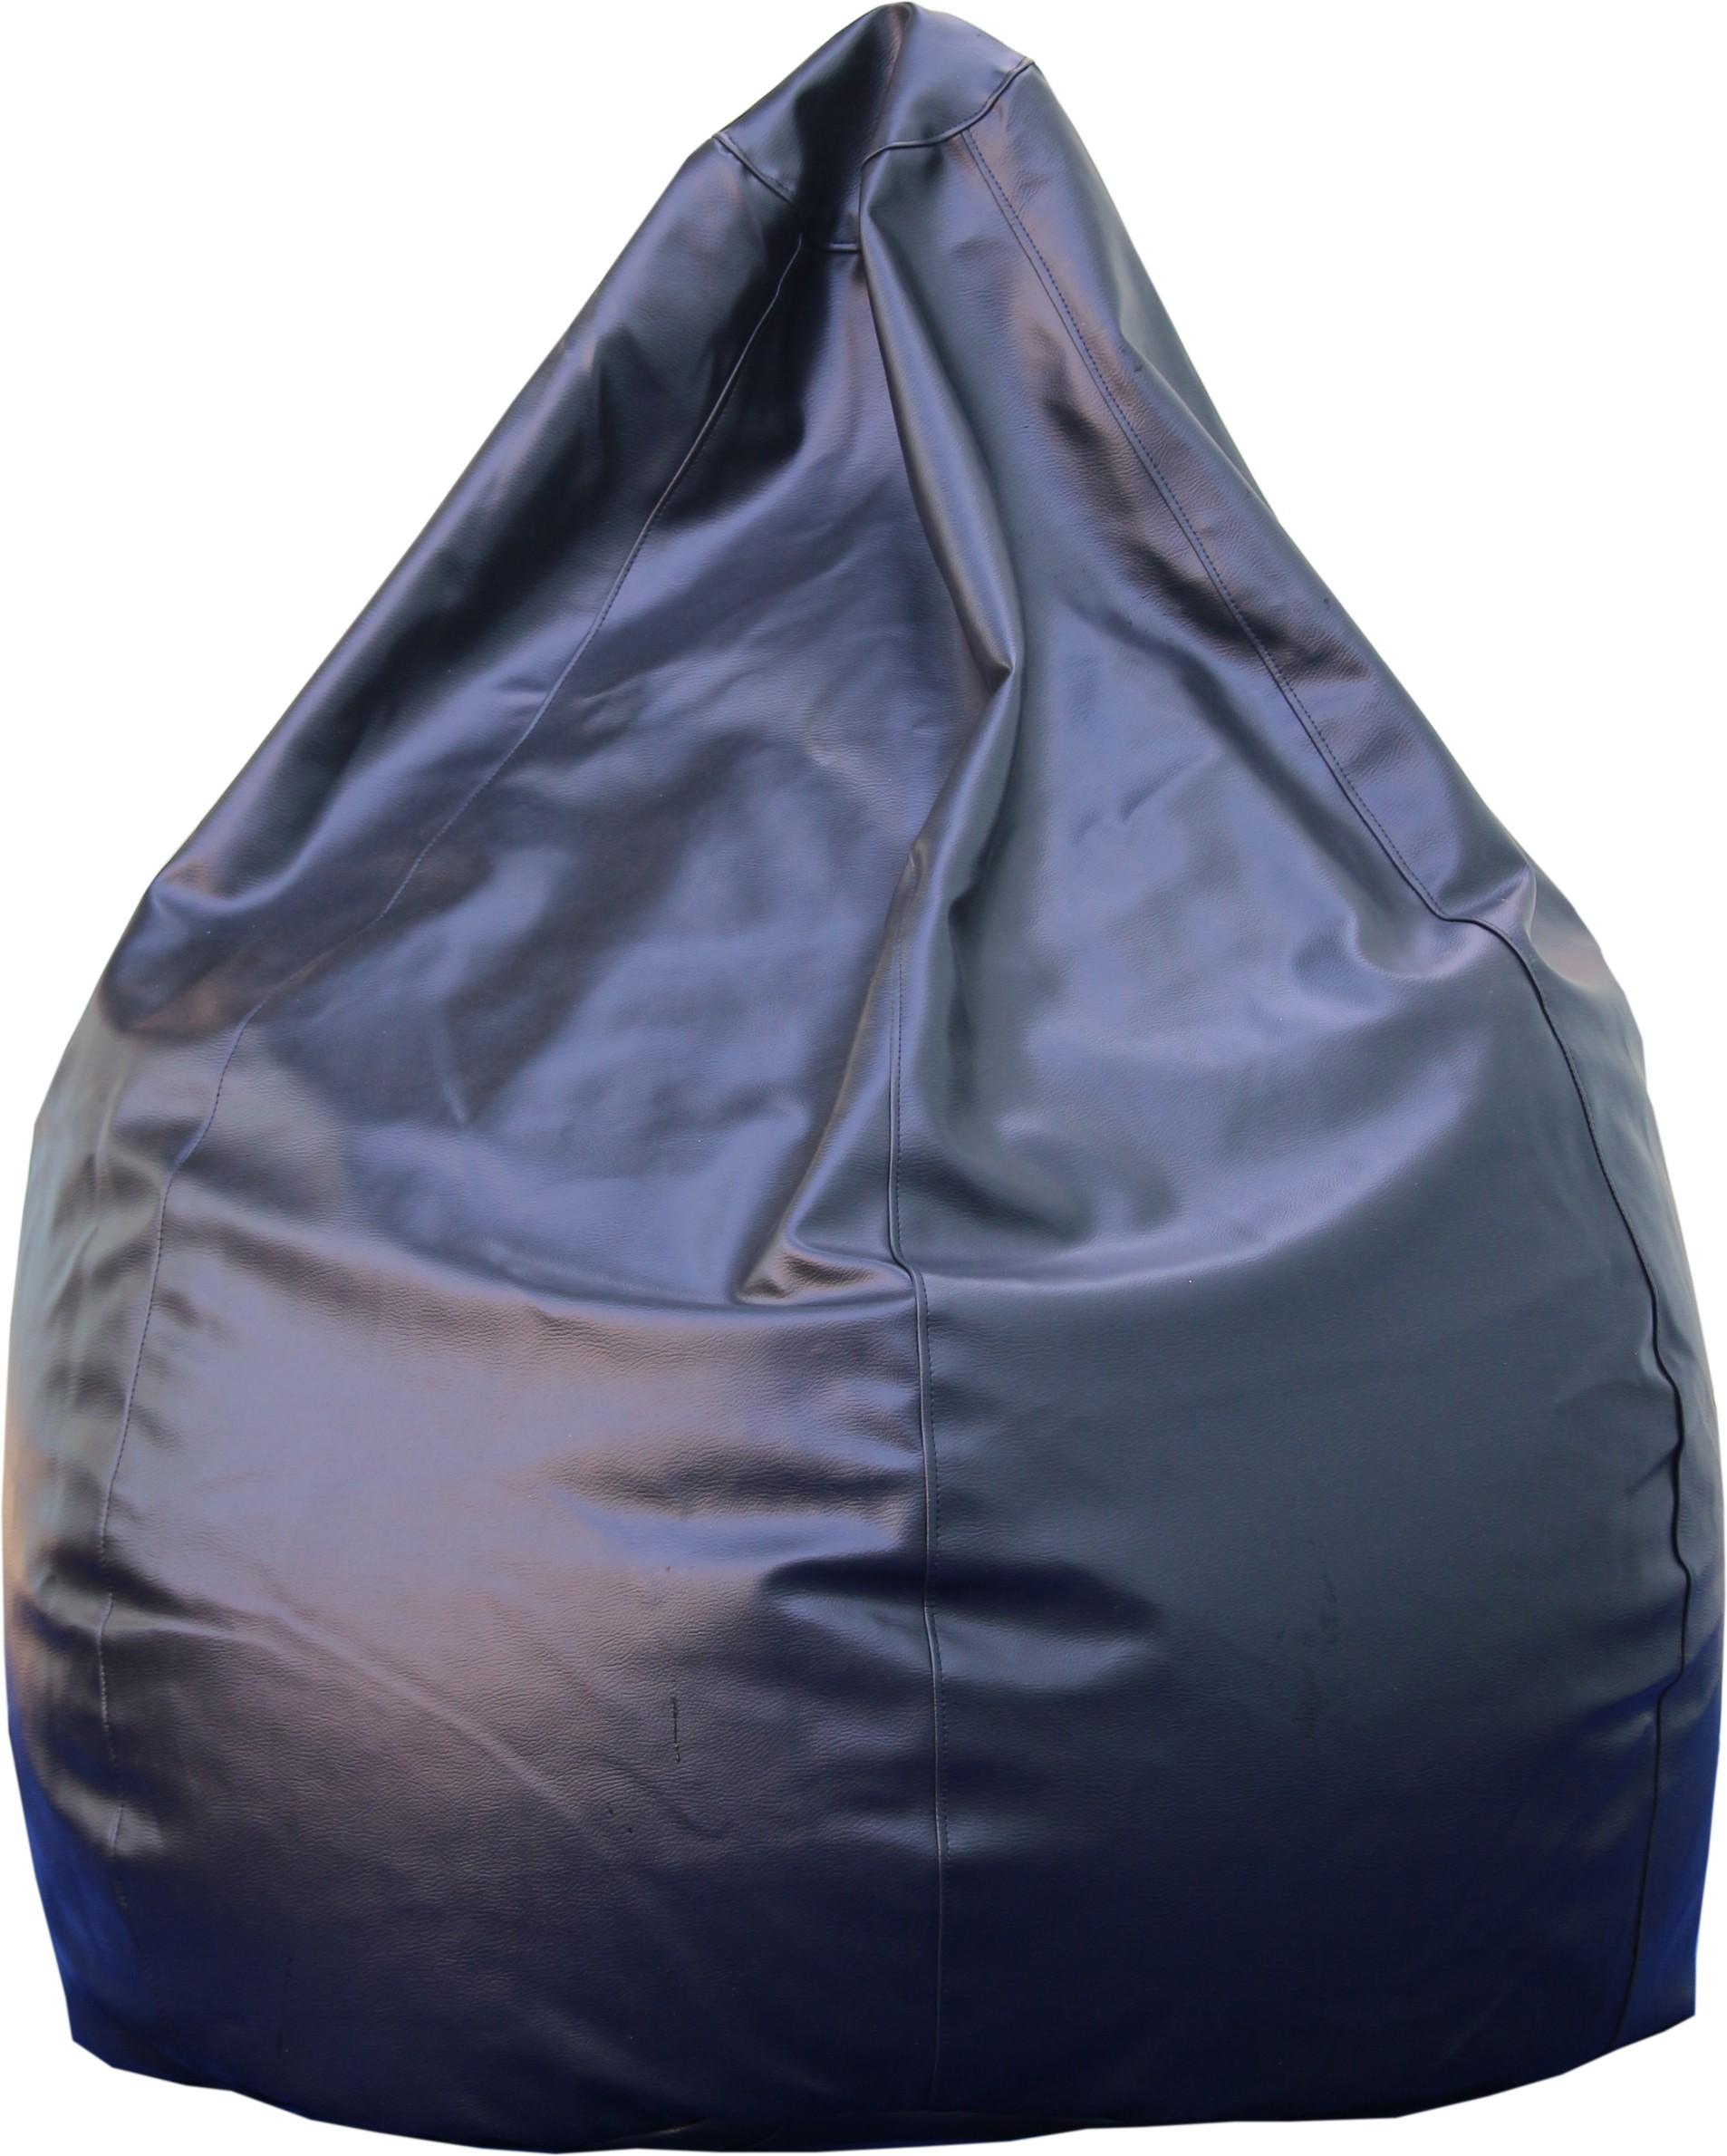 View Beanskart XXL Bean Bag  With Bean Filling(Black) Furniture (Beanskart)